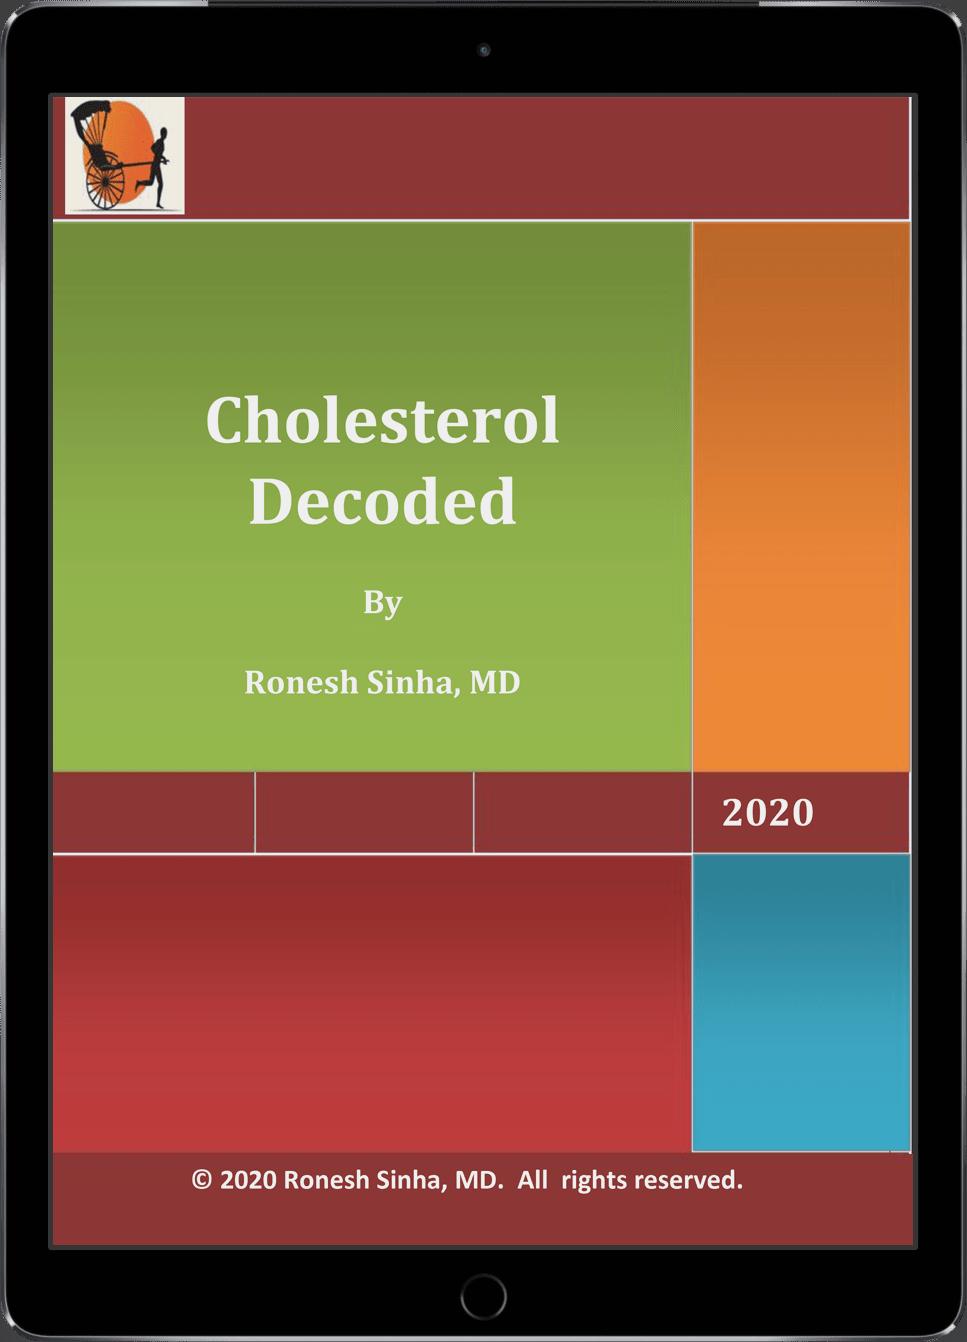 Cholesterol Decoded ebook on iPad